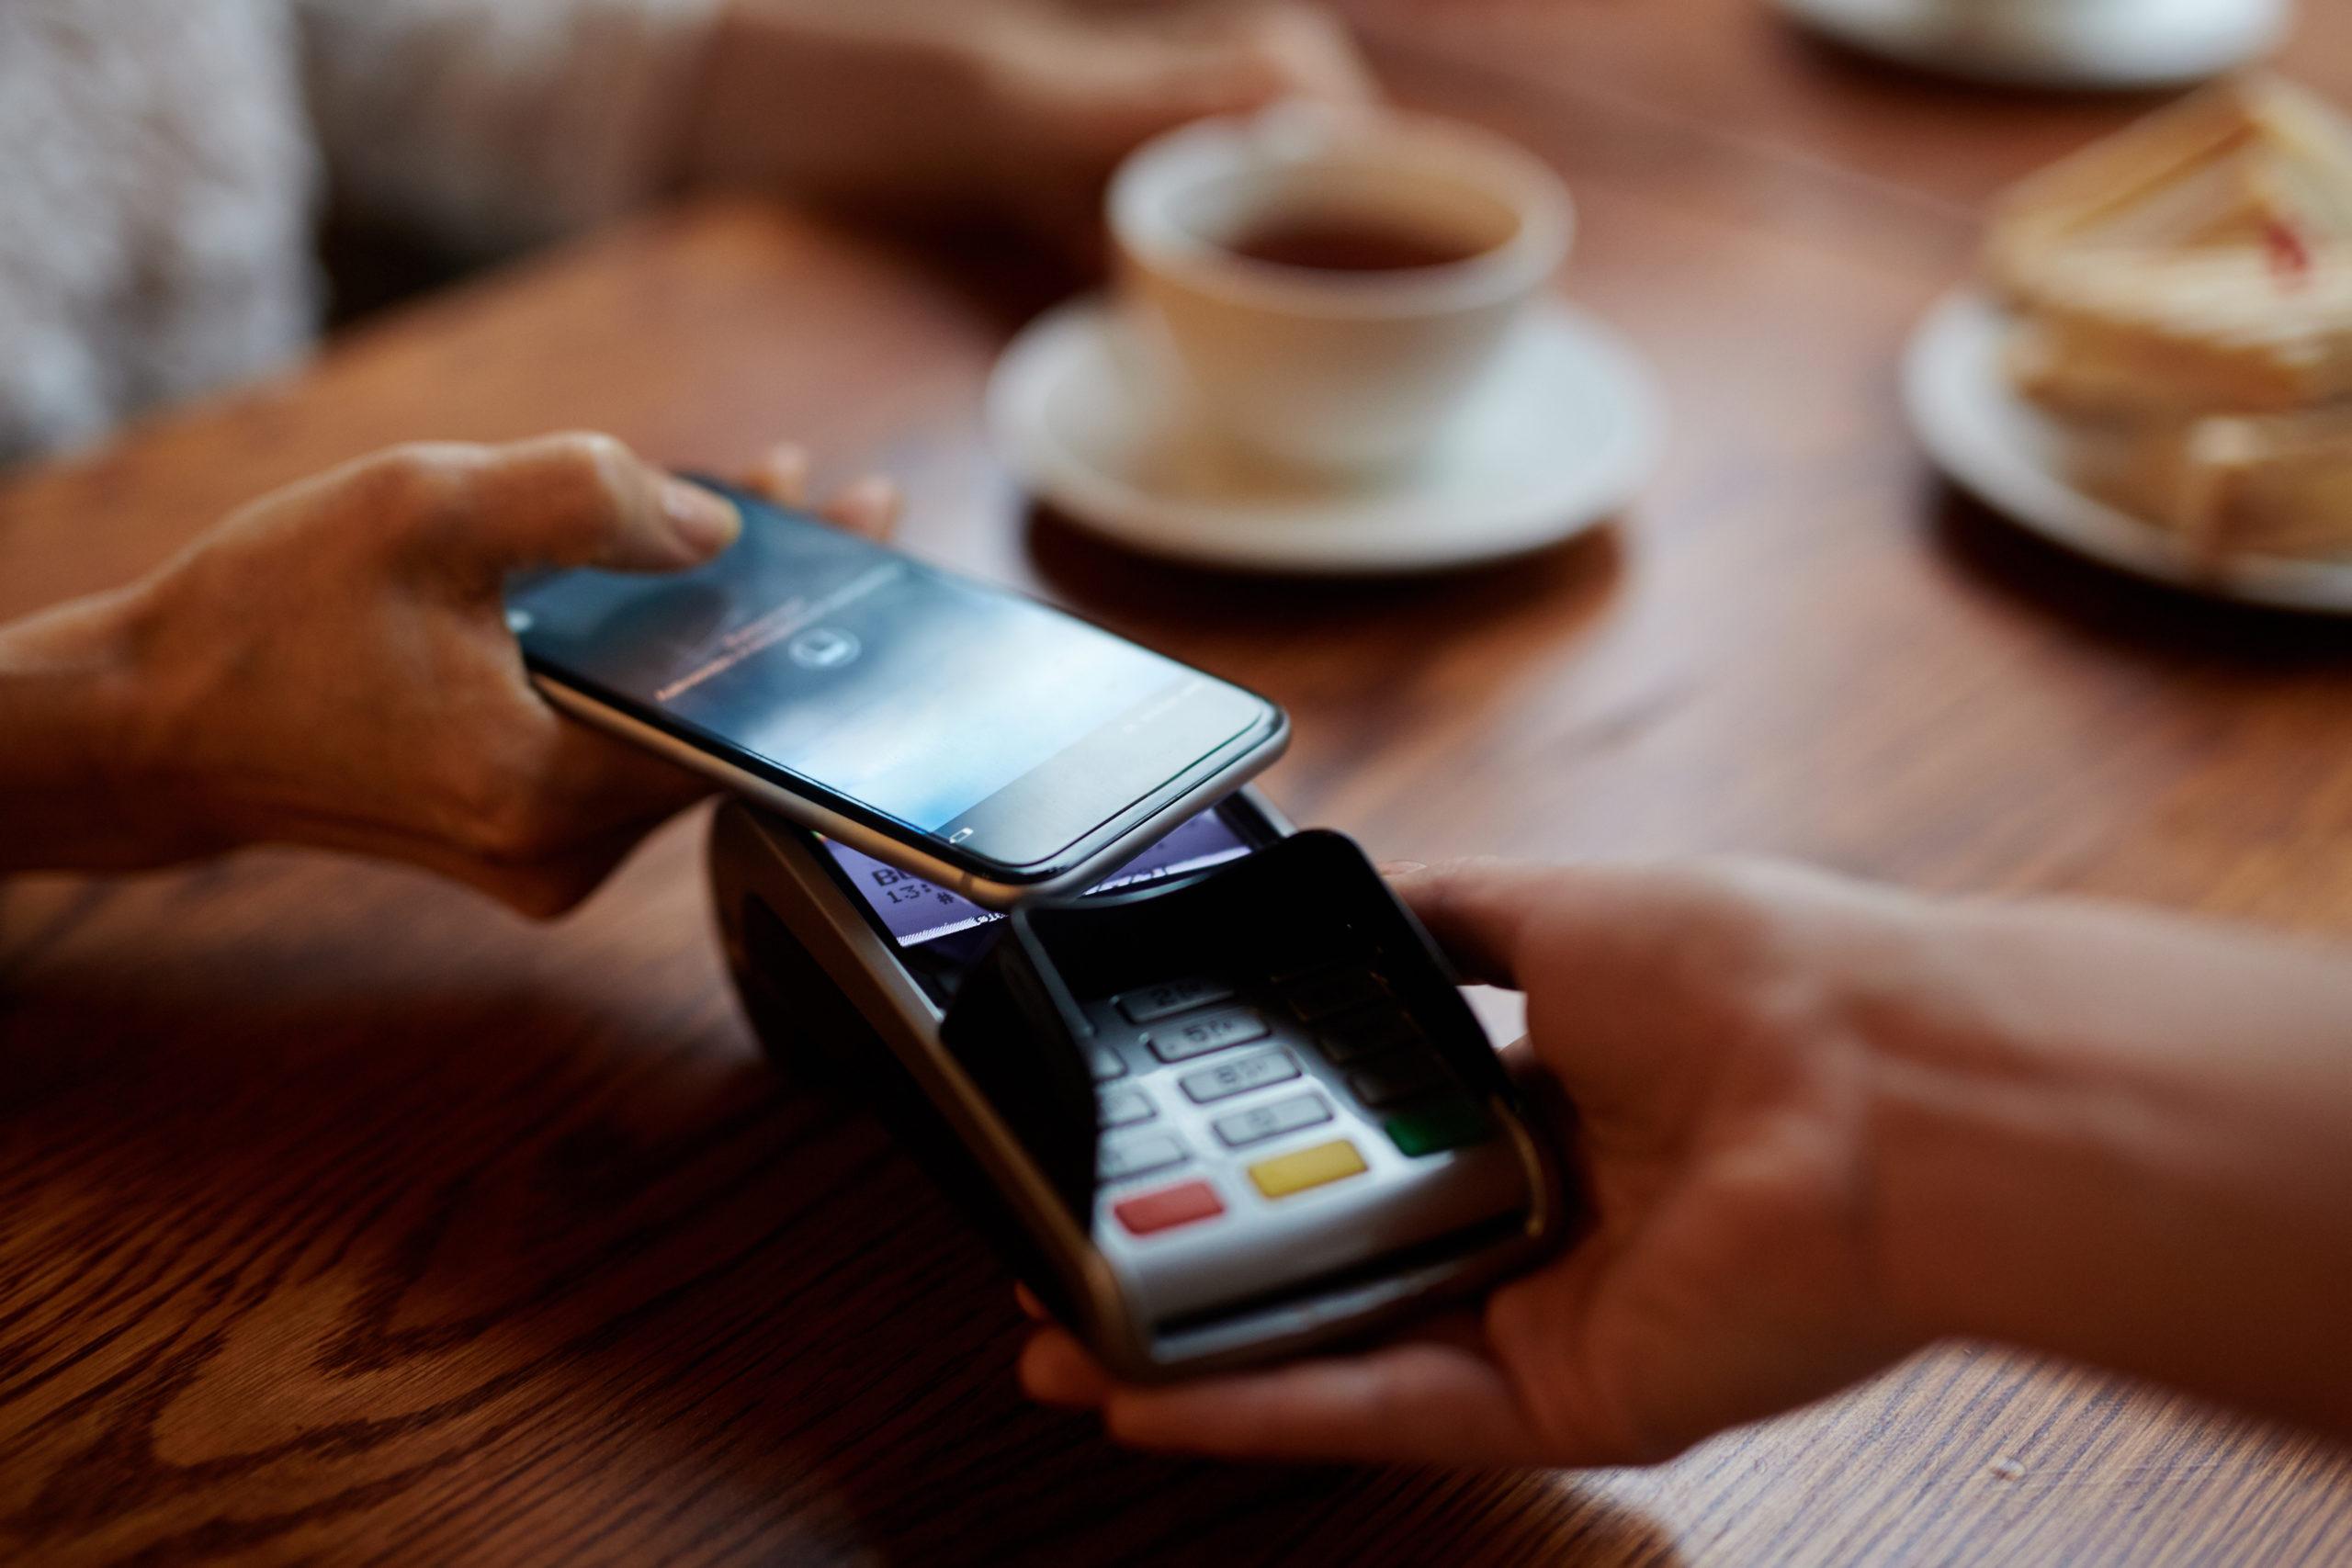 Customer Making Payment Via Mobile